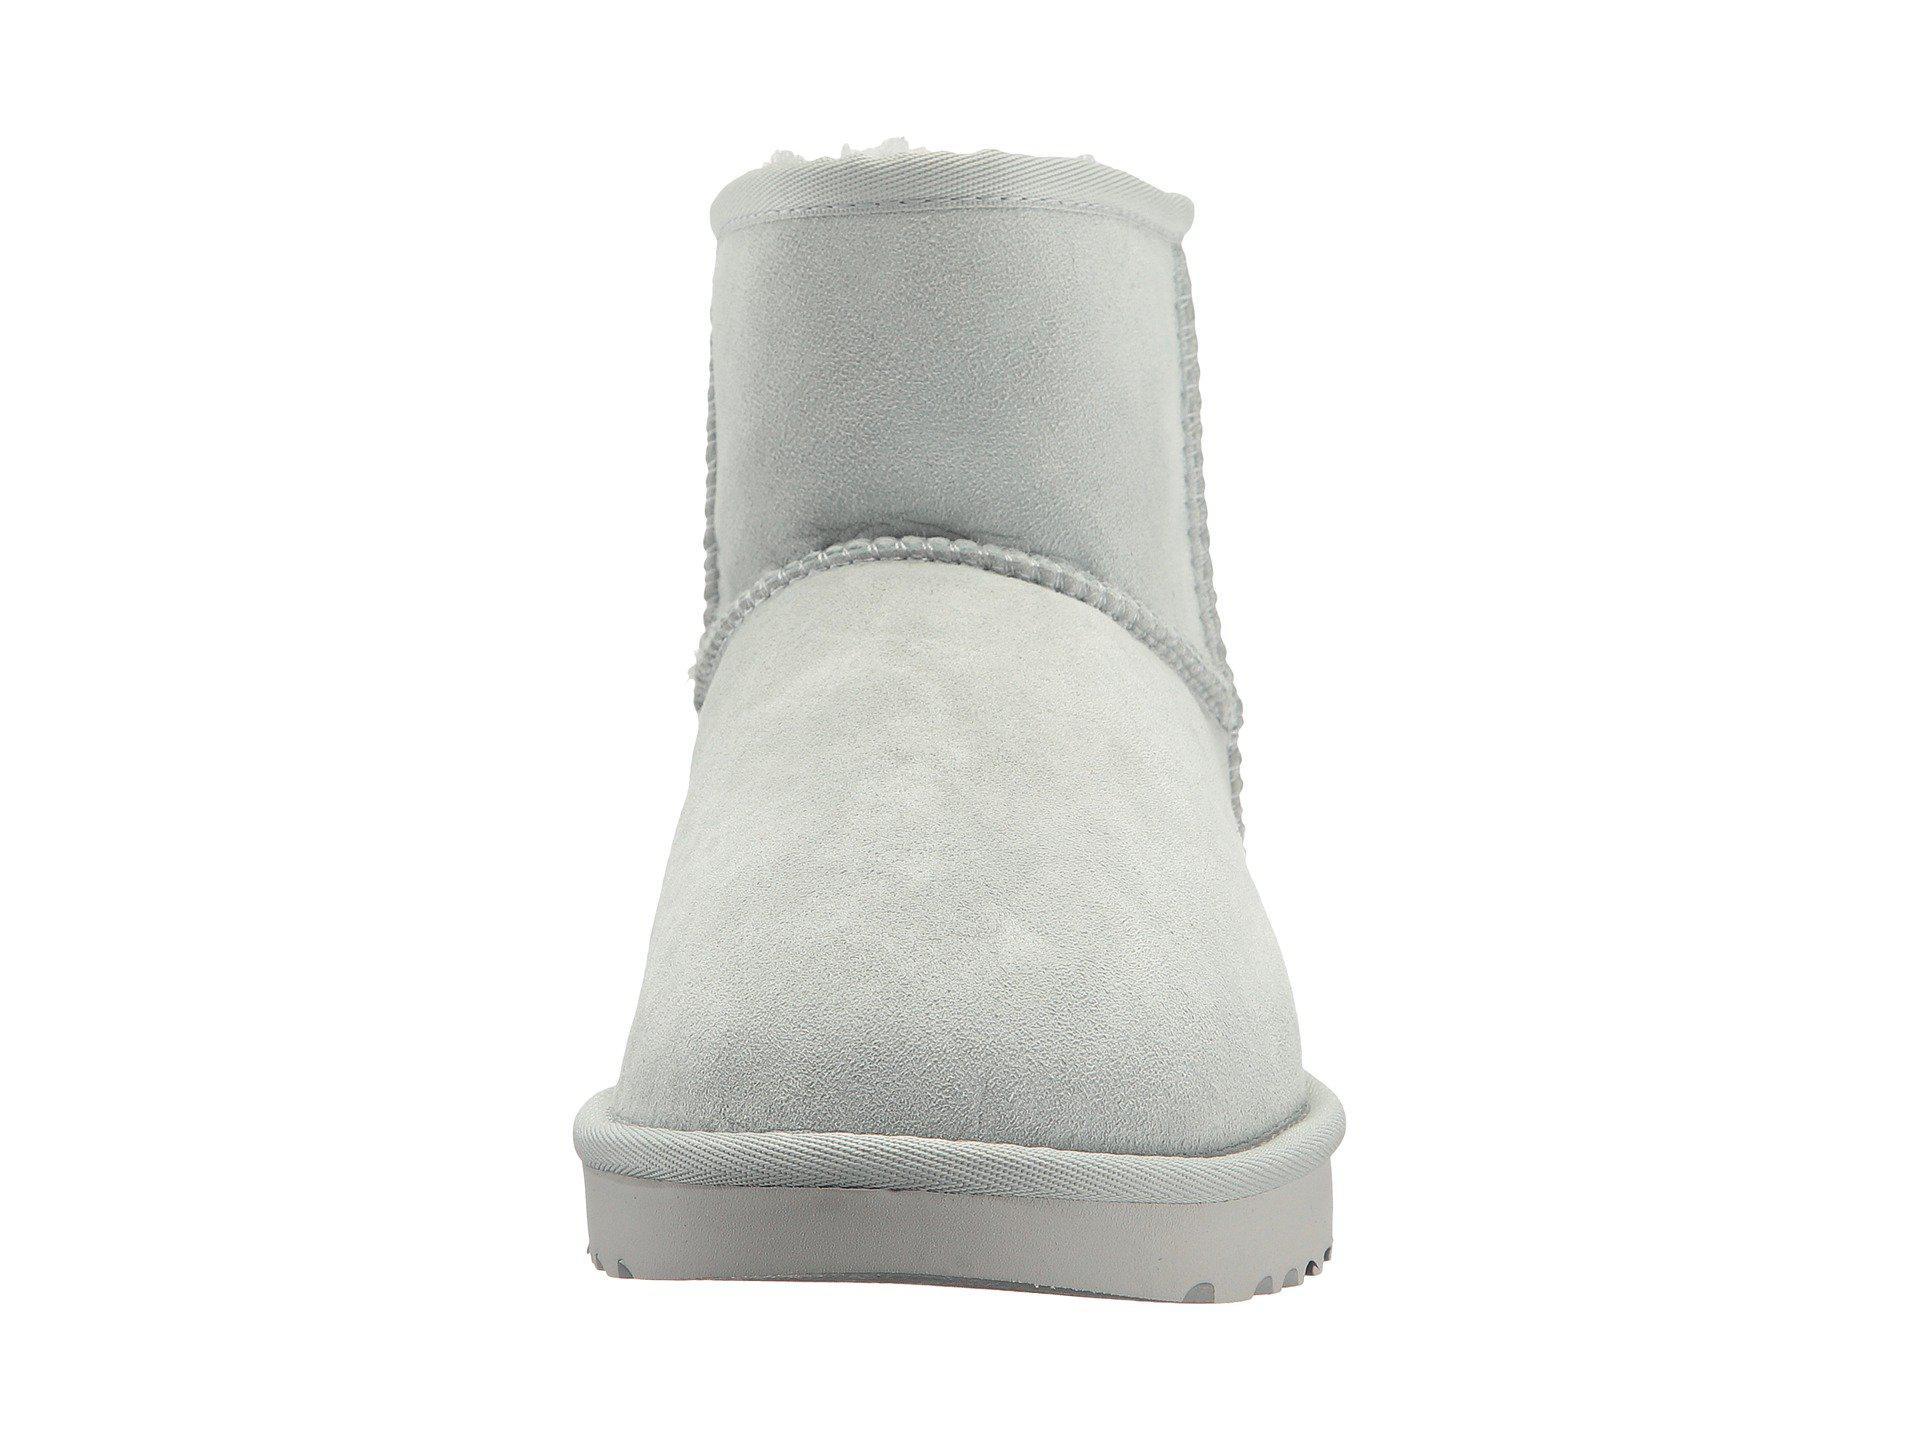 8d17c8870a7 Ugg Multicolor Classic Mini Ii Metallic (iceberg) Women's Boots